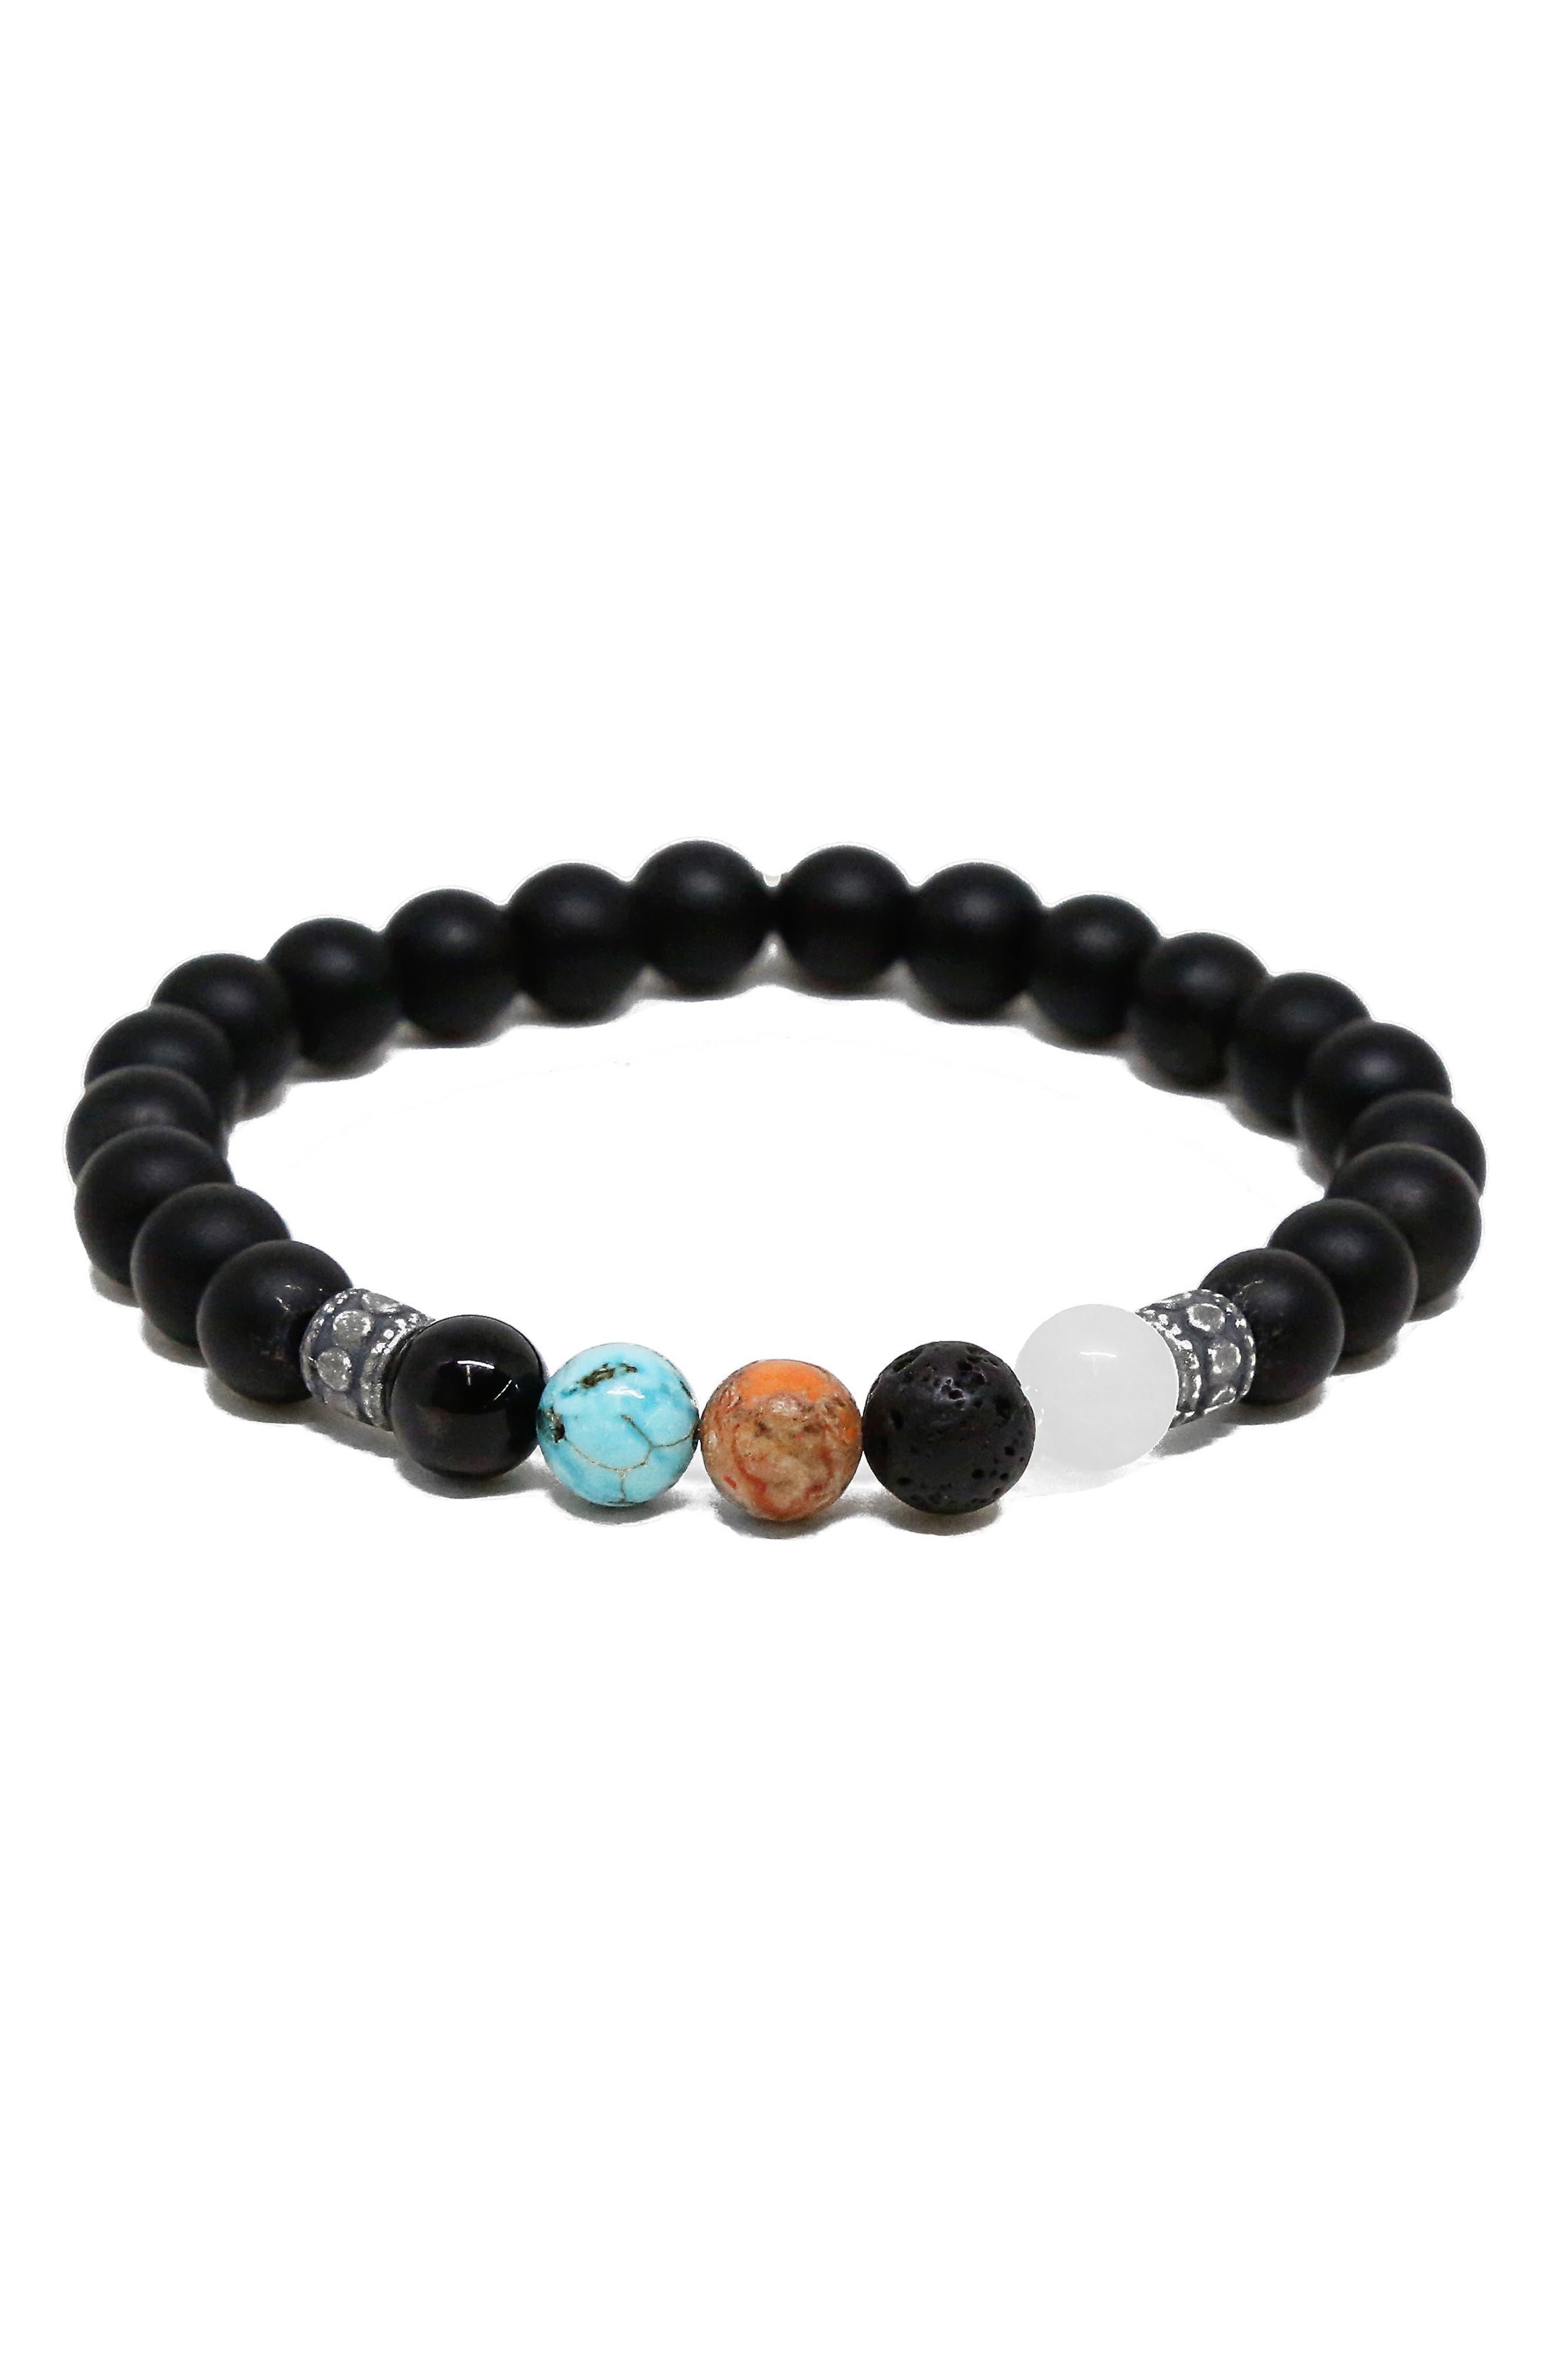 Mr. Ettika Stone Bead Bracelet